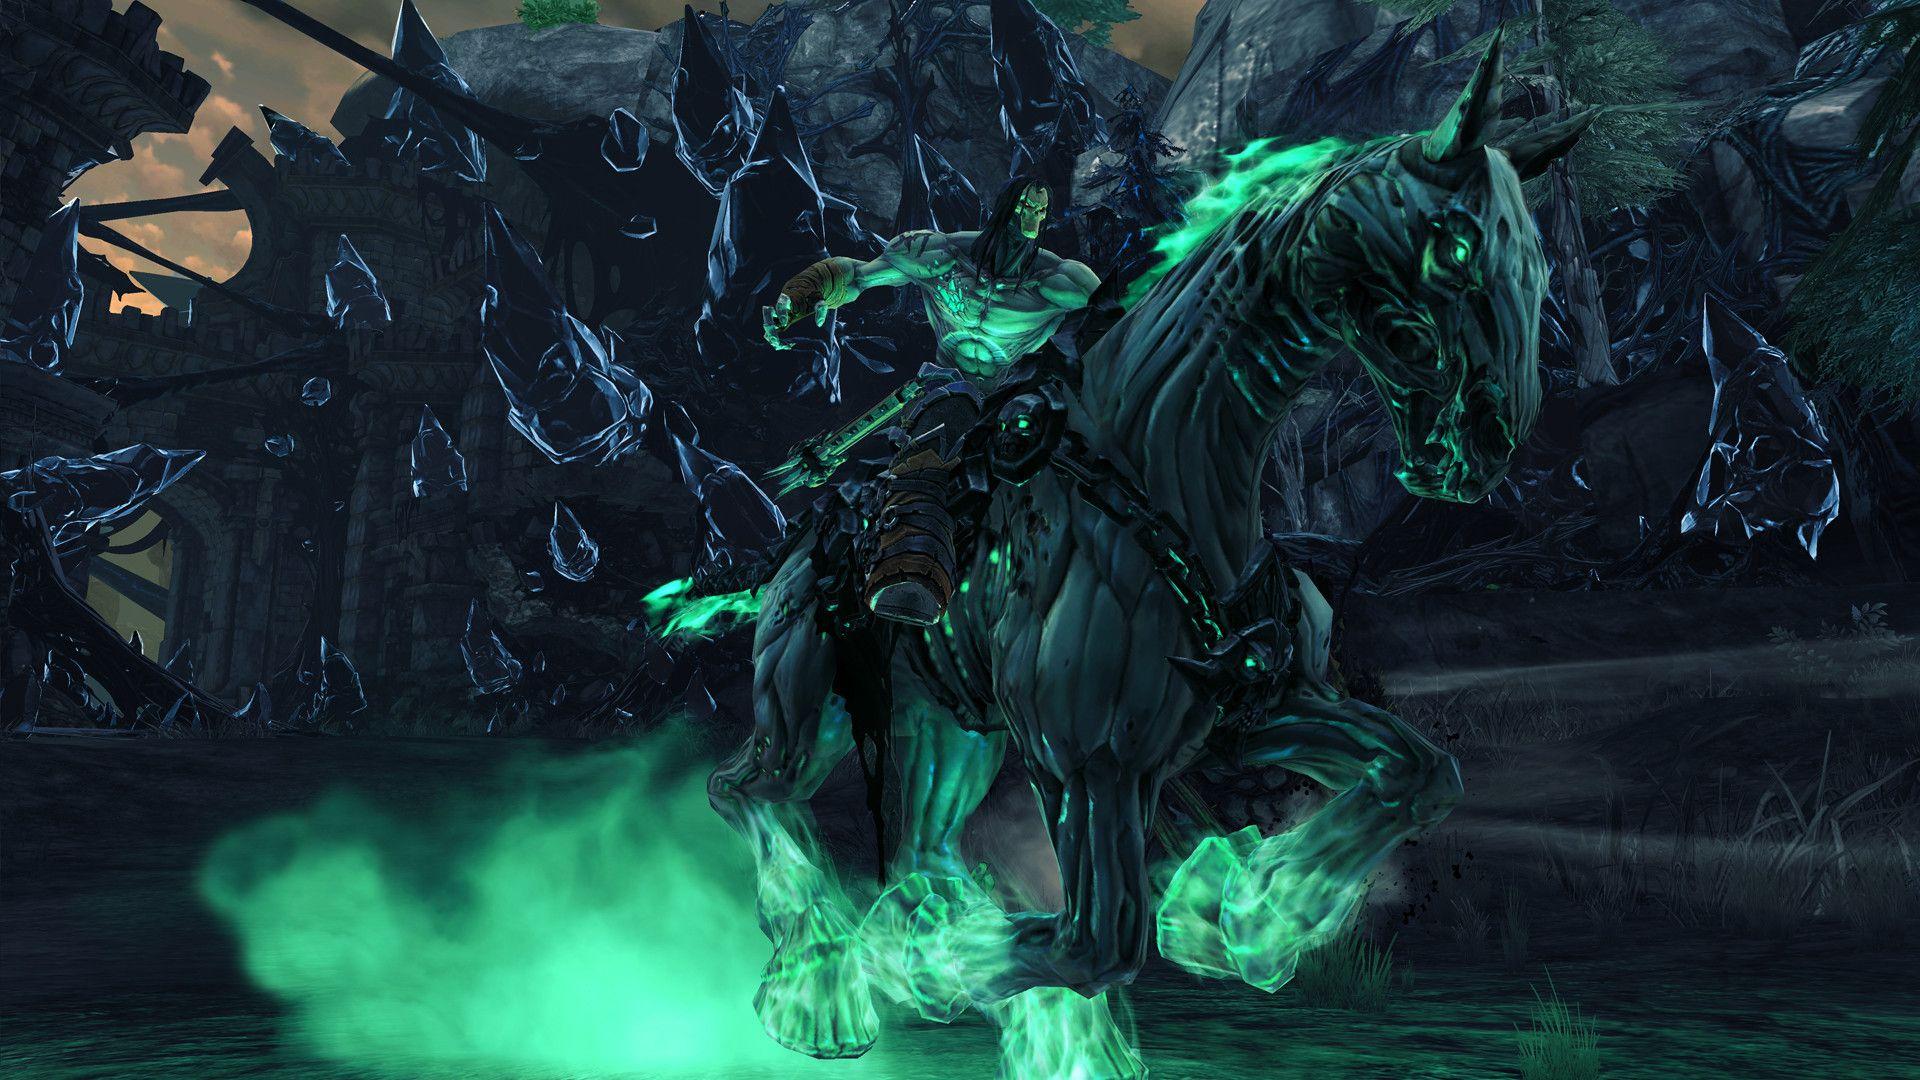 Badass Grim Reaper Wallpaper Posted By Ryan Walker